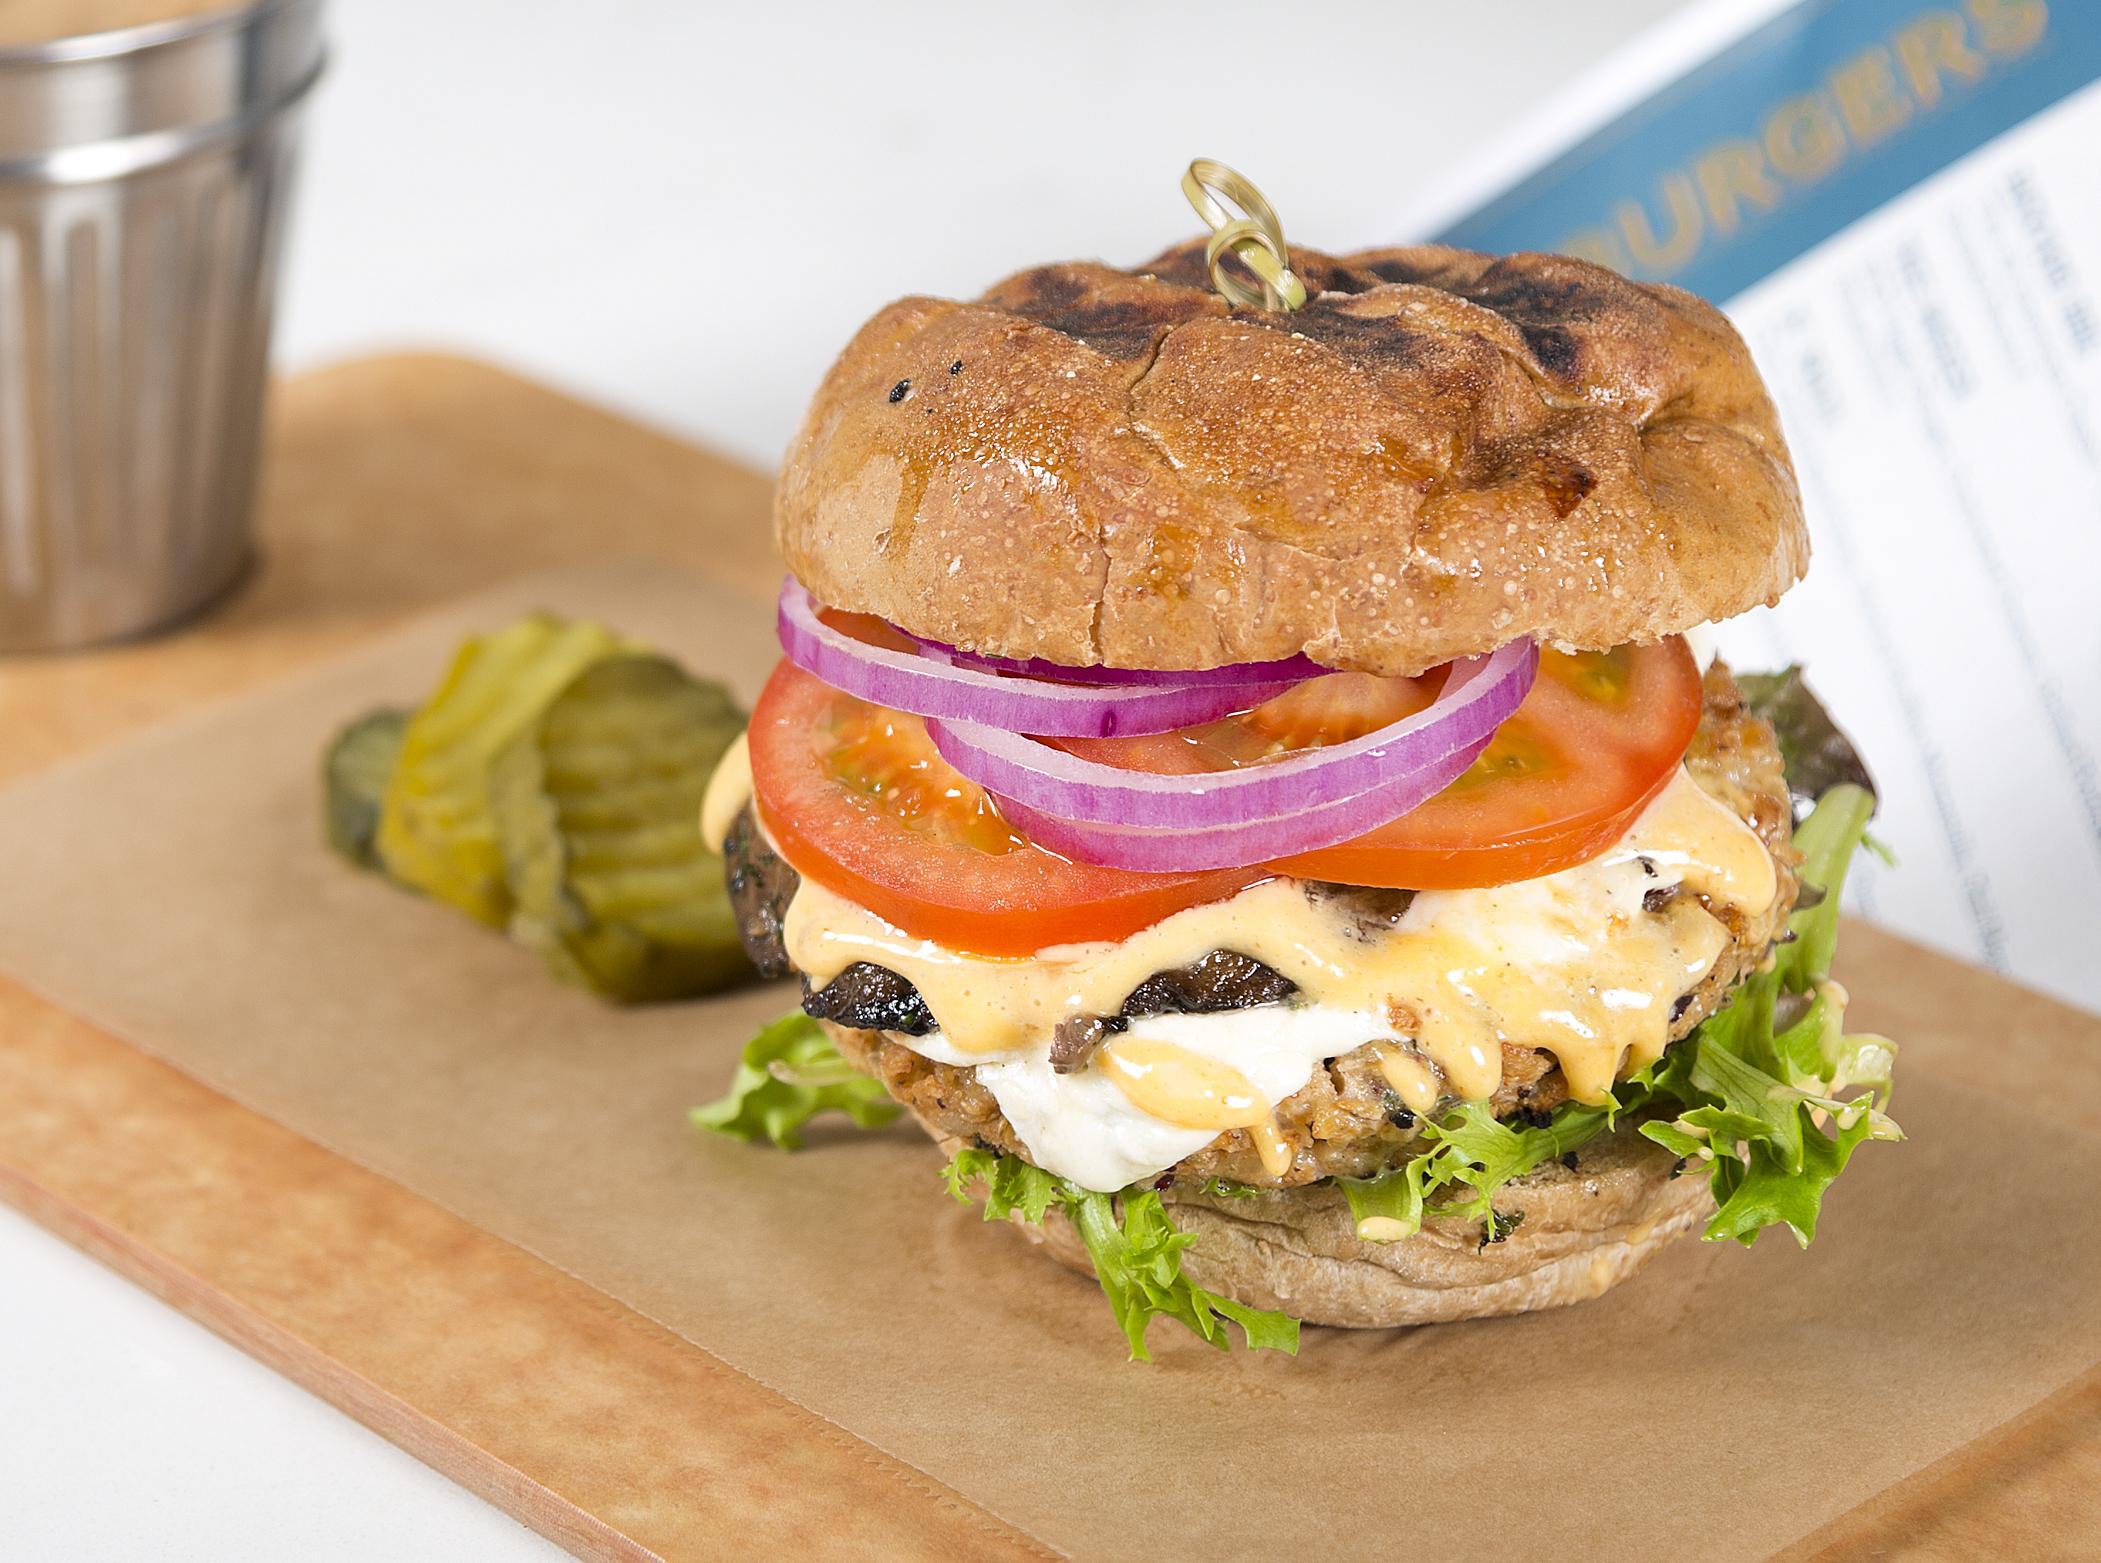 TREE HUGGER   Housemade Vegetarian Burger, Garden Greens, Grilled Portobellos, Melted Mozzarella, Florida Tomato, Avocado, Onions, Spicy Aioli, Toasted Wheat Roll